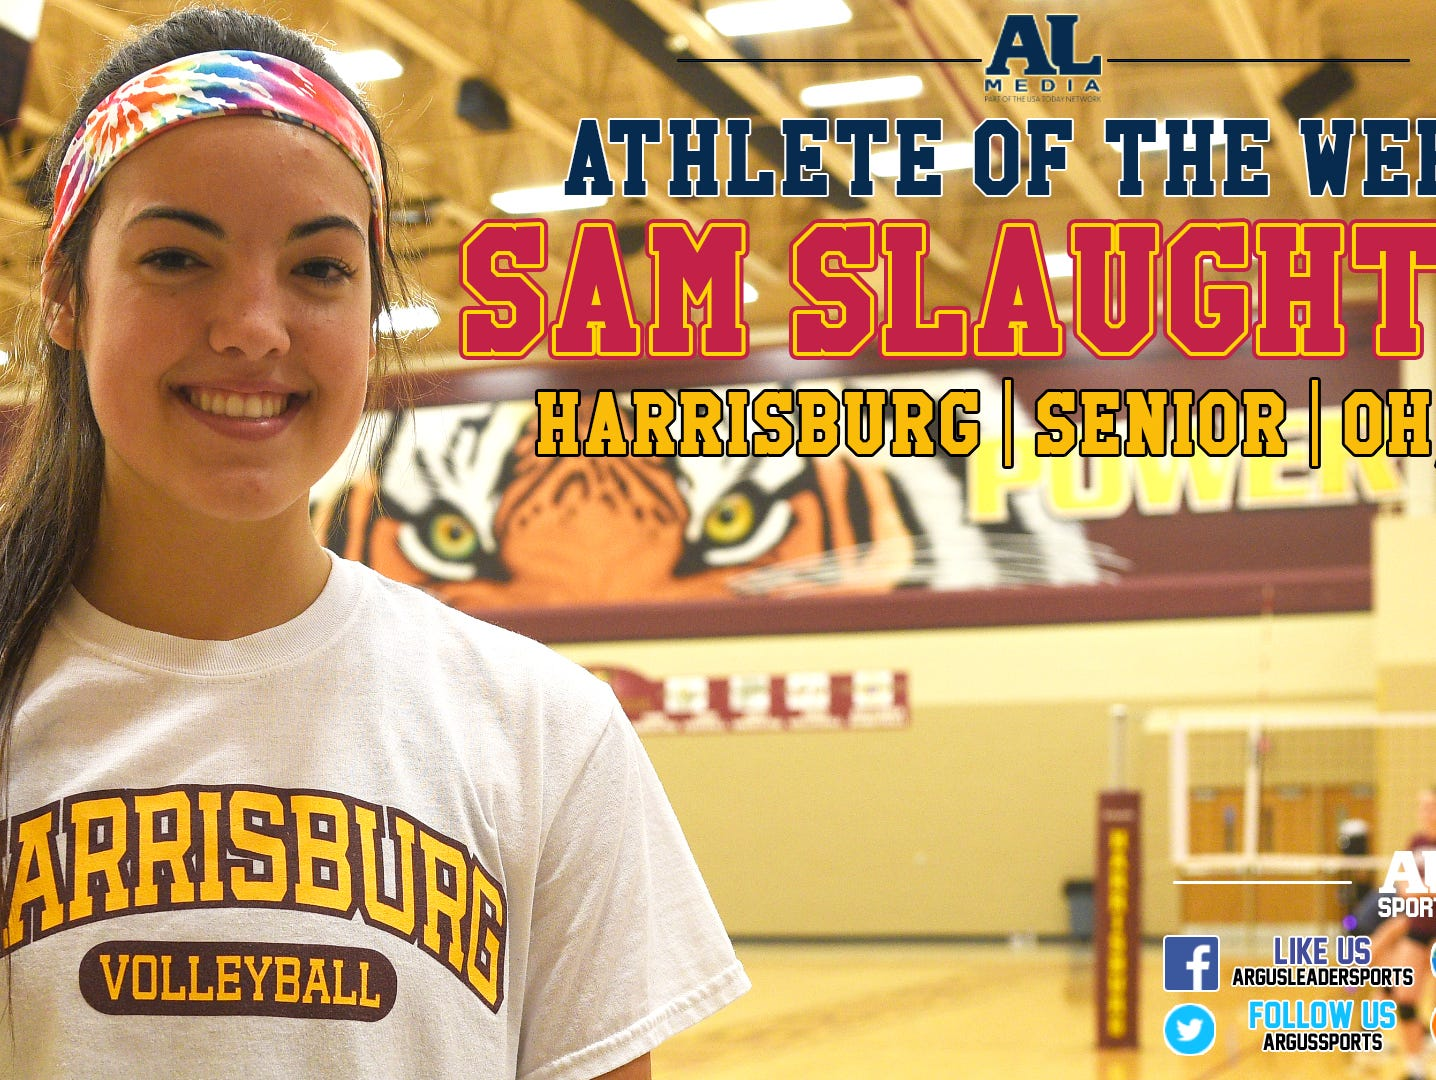 Harrisburg volleyball standout Sam Slaughter